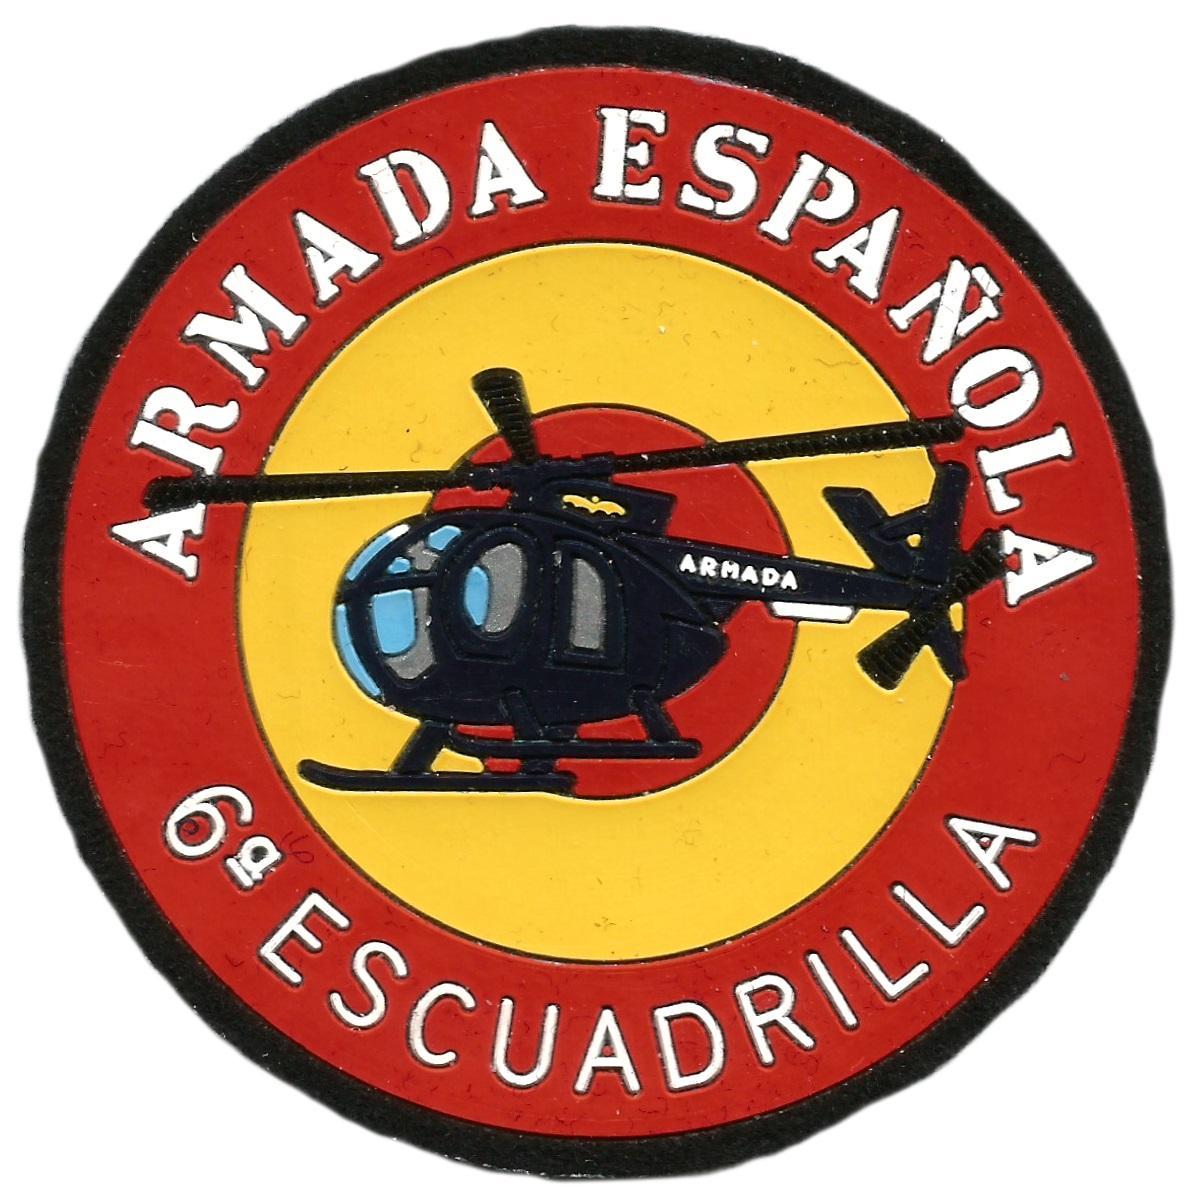 Ejército Armada española 6 Escuadrilla parche insignia emblema distintivo